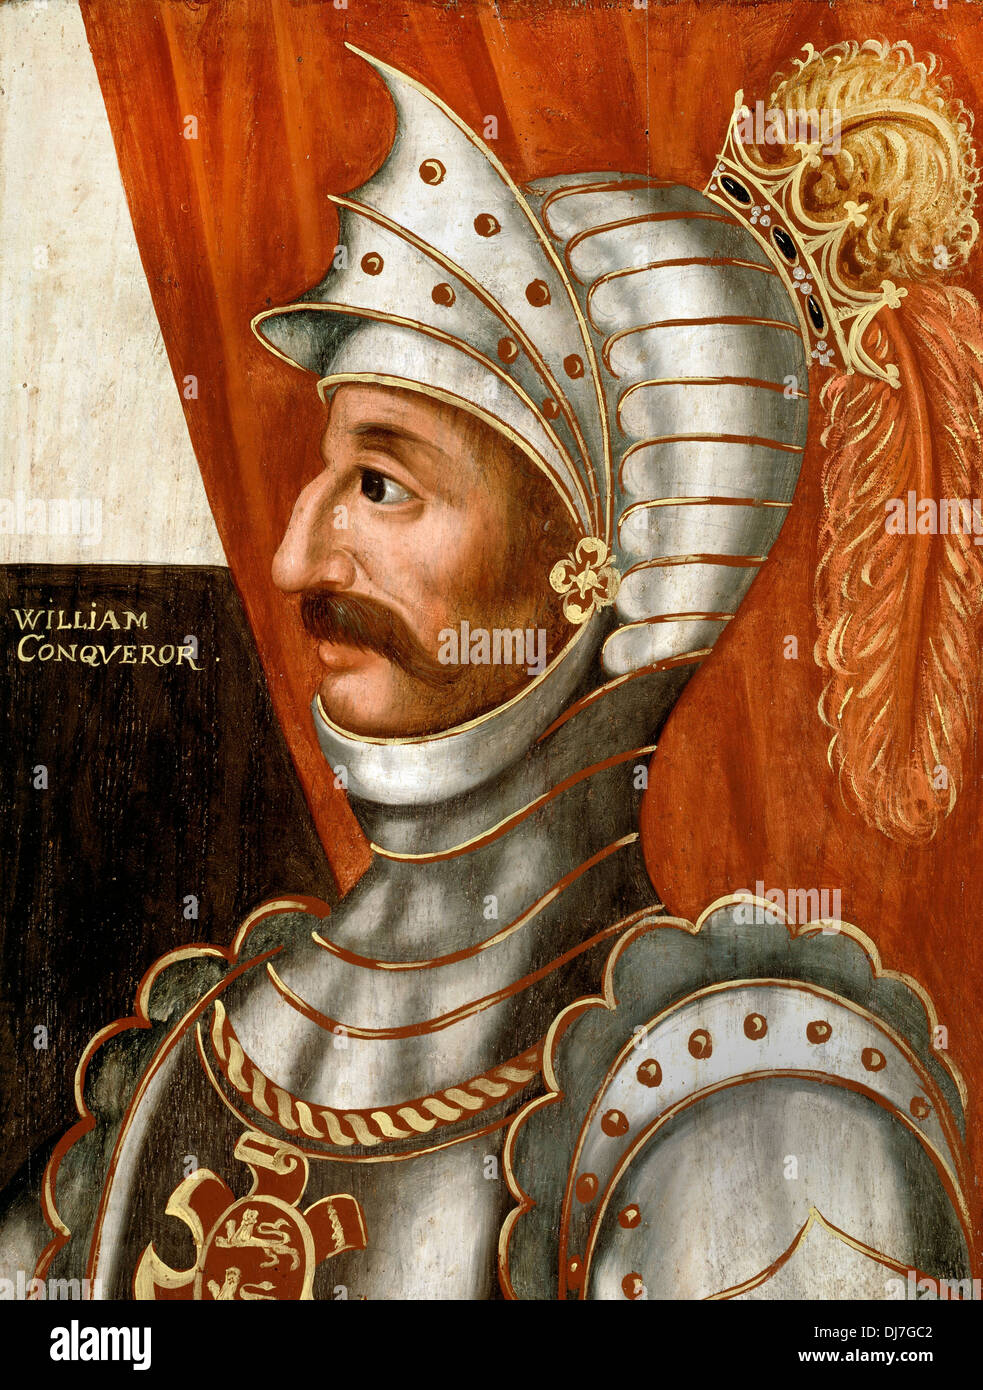 British School. William the Conqueror. Circa 1618-20. Oil on panel. Dulwich Picture Gallery, London. - Stock Image